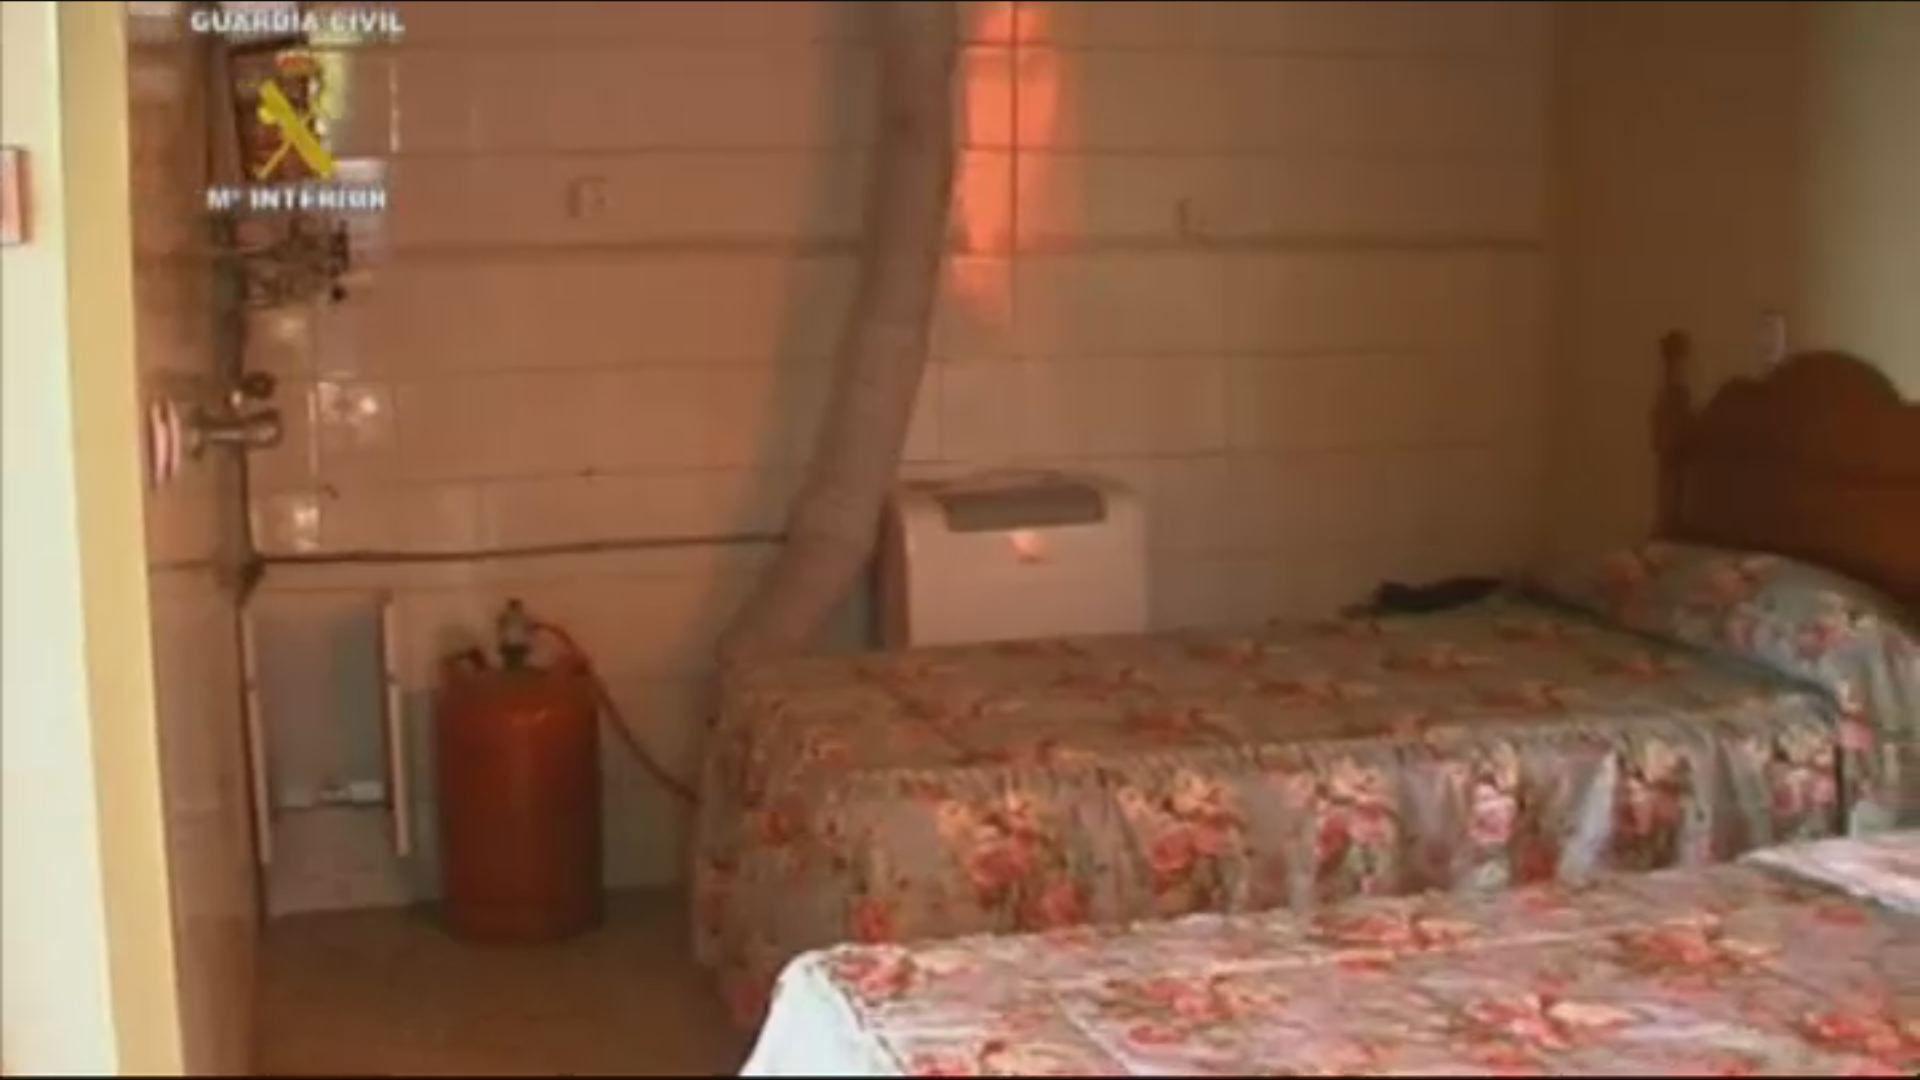 Así era la casa de los horrores de Cádiz.Entrada de la casa de los horrores de Chiclana